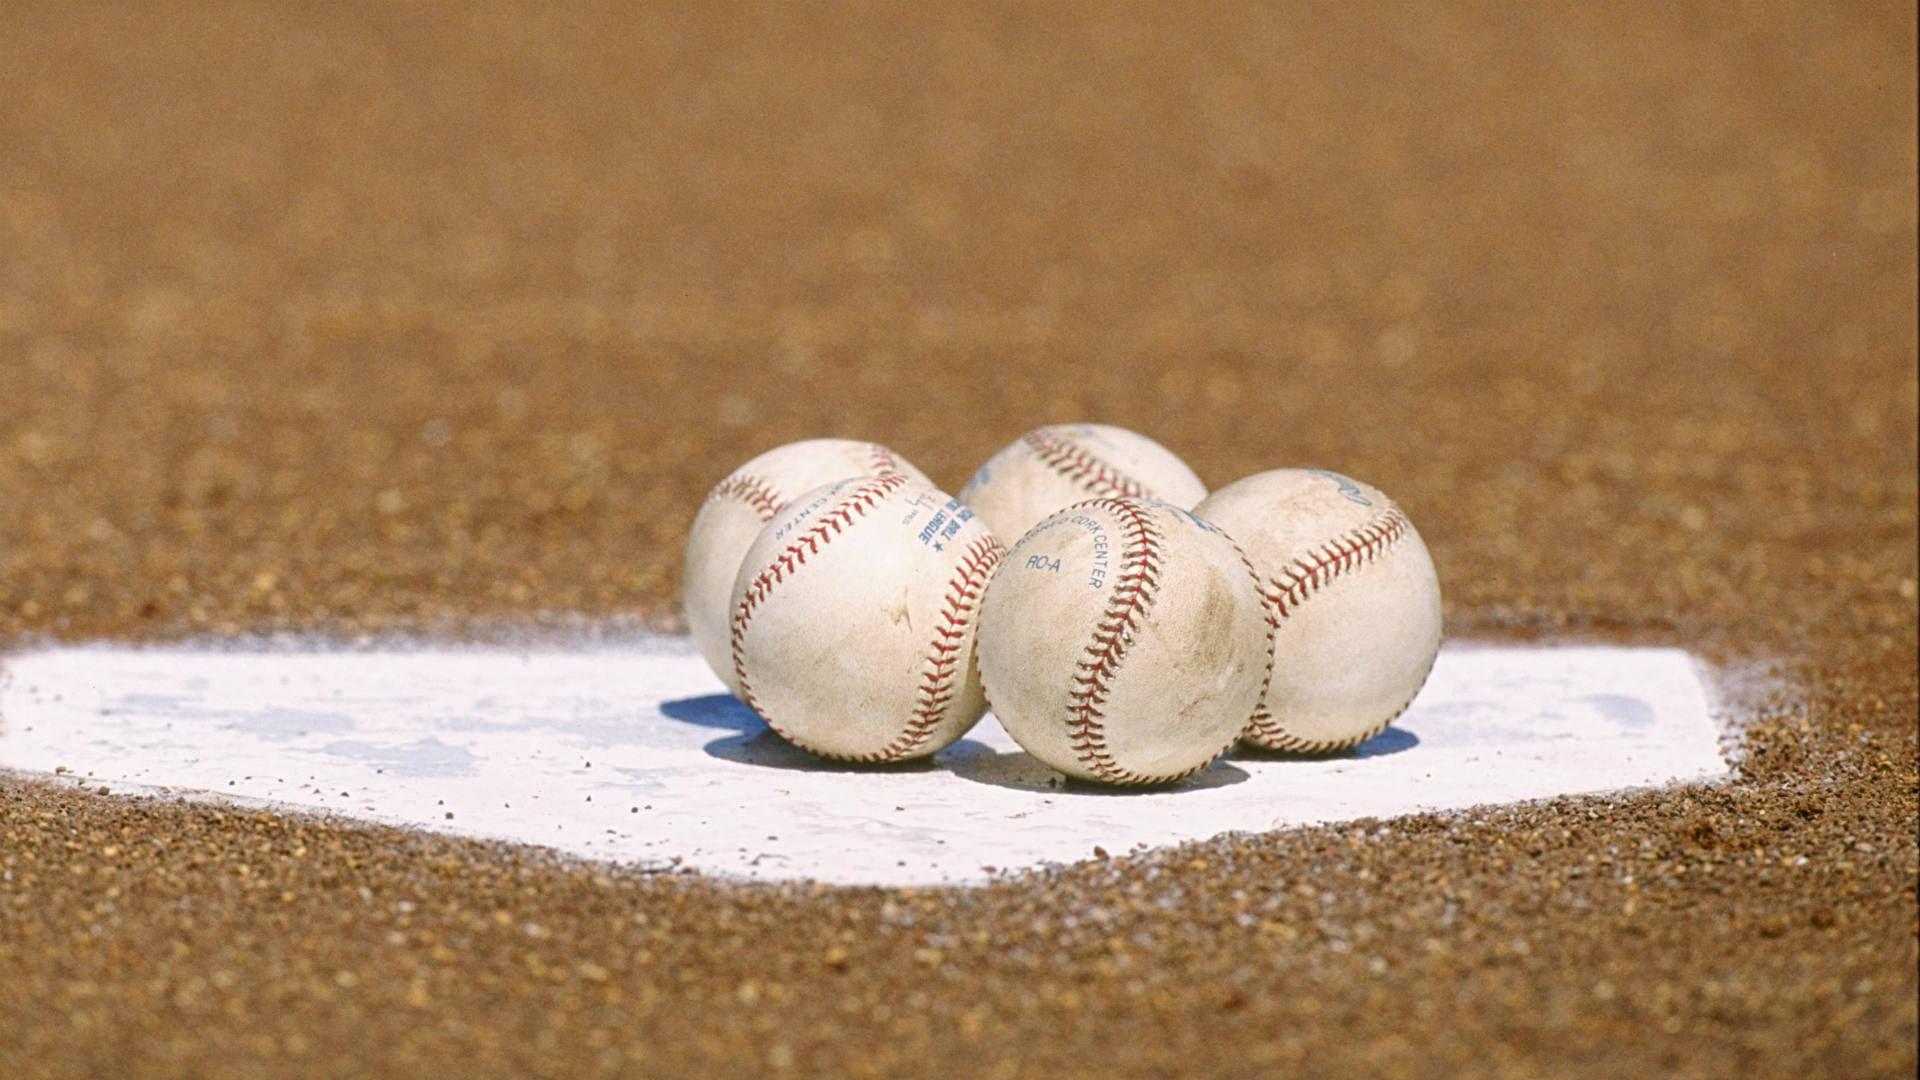 Vanderbilt's Jack Leiter bids for back-to-back no-hitters; coach's call ends pursuit